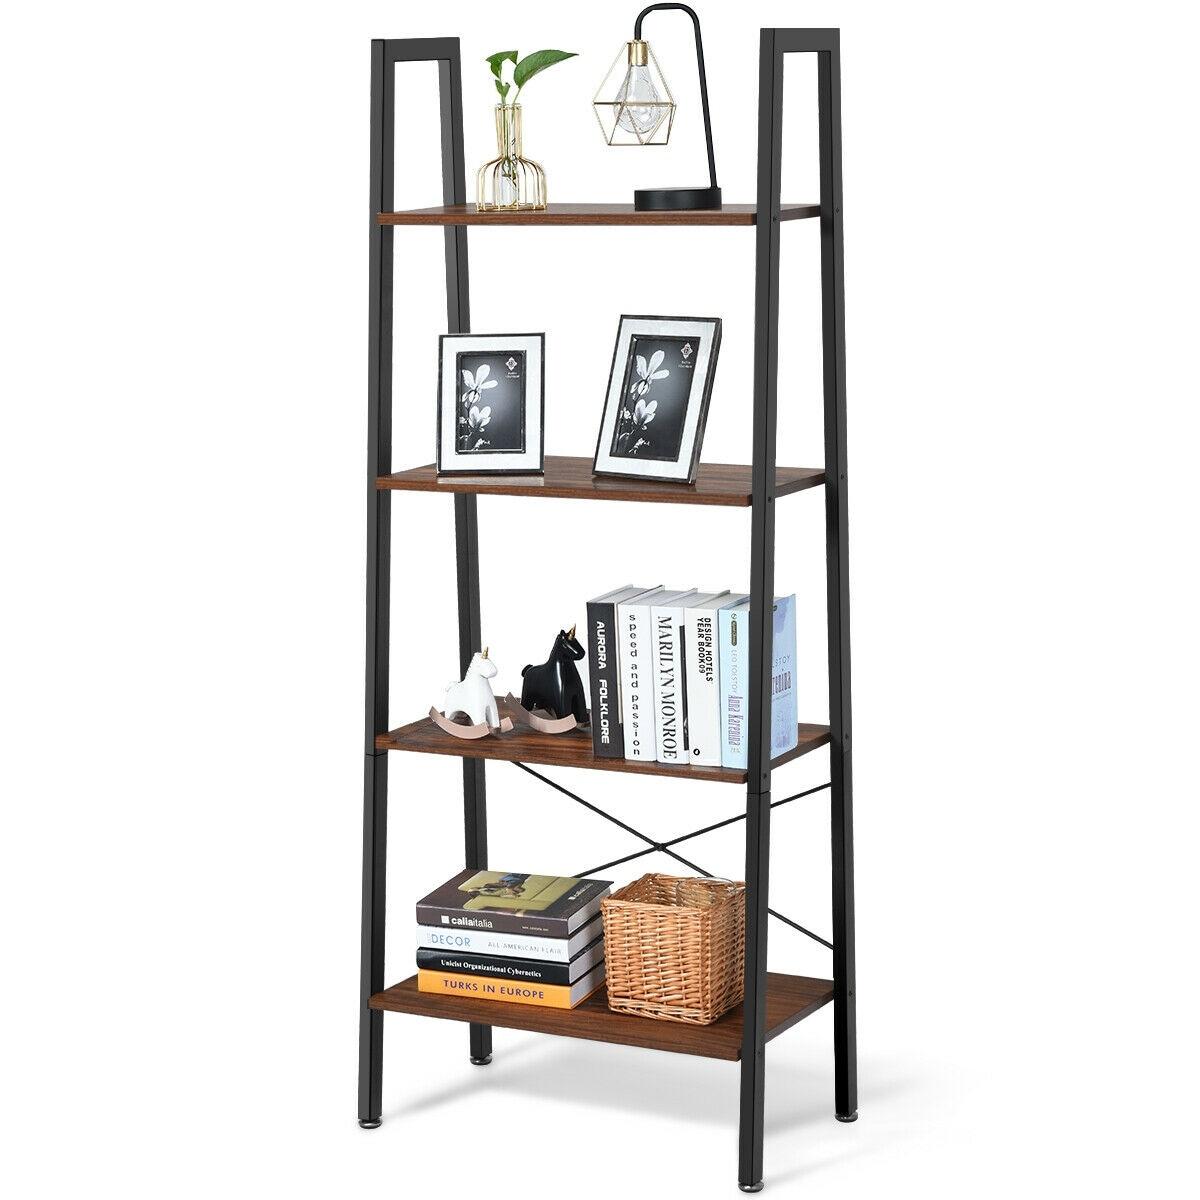 4 Tiers Wood Ladder Bookcase Plants Shelf Unit Storage Stand Bookshelf Display